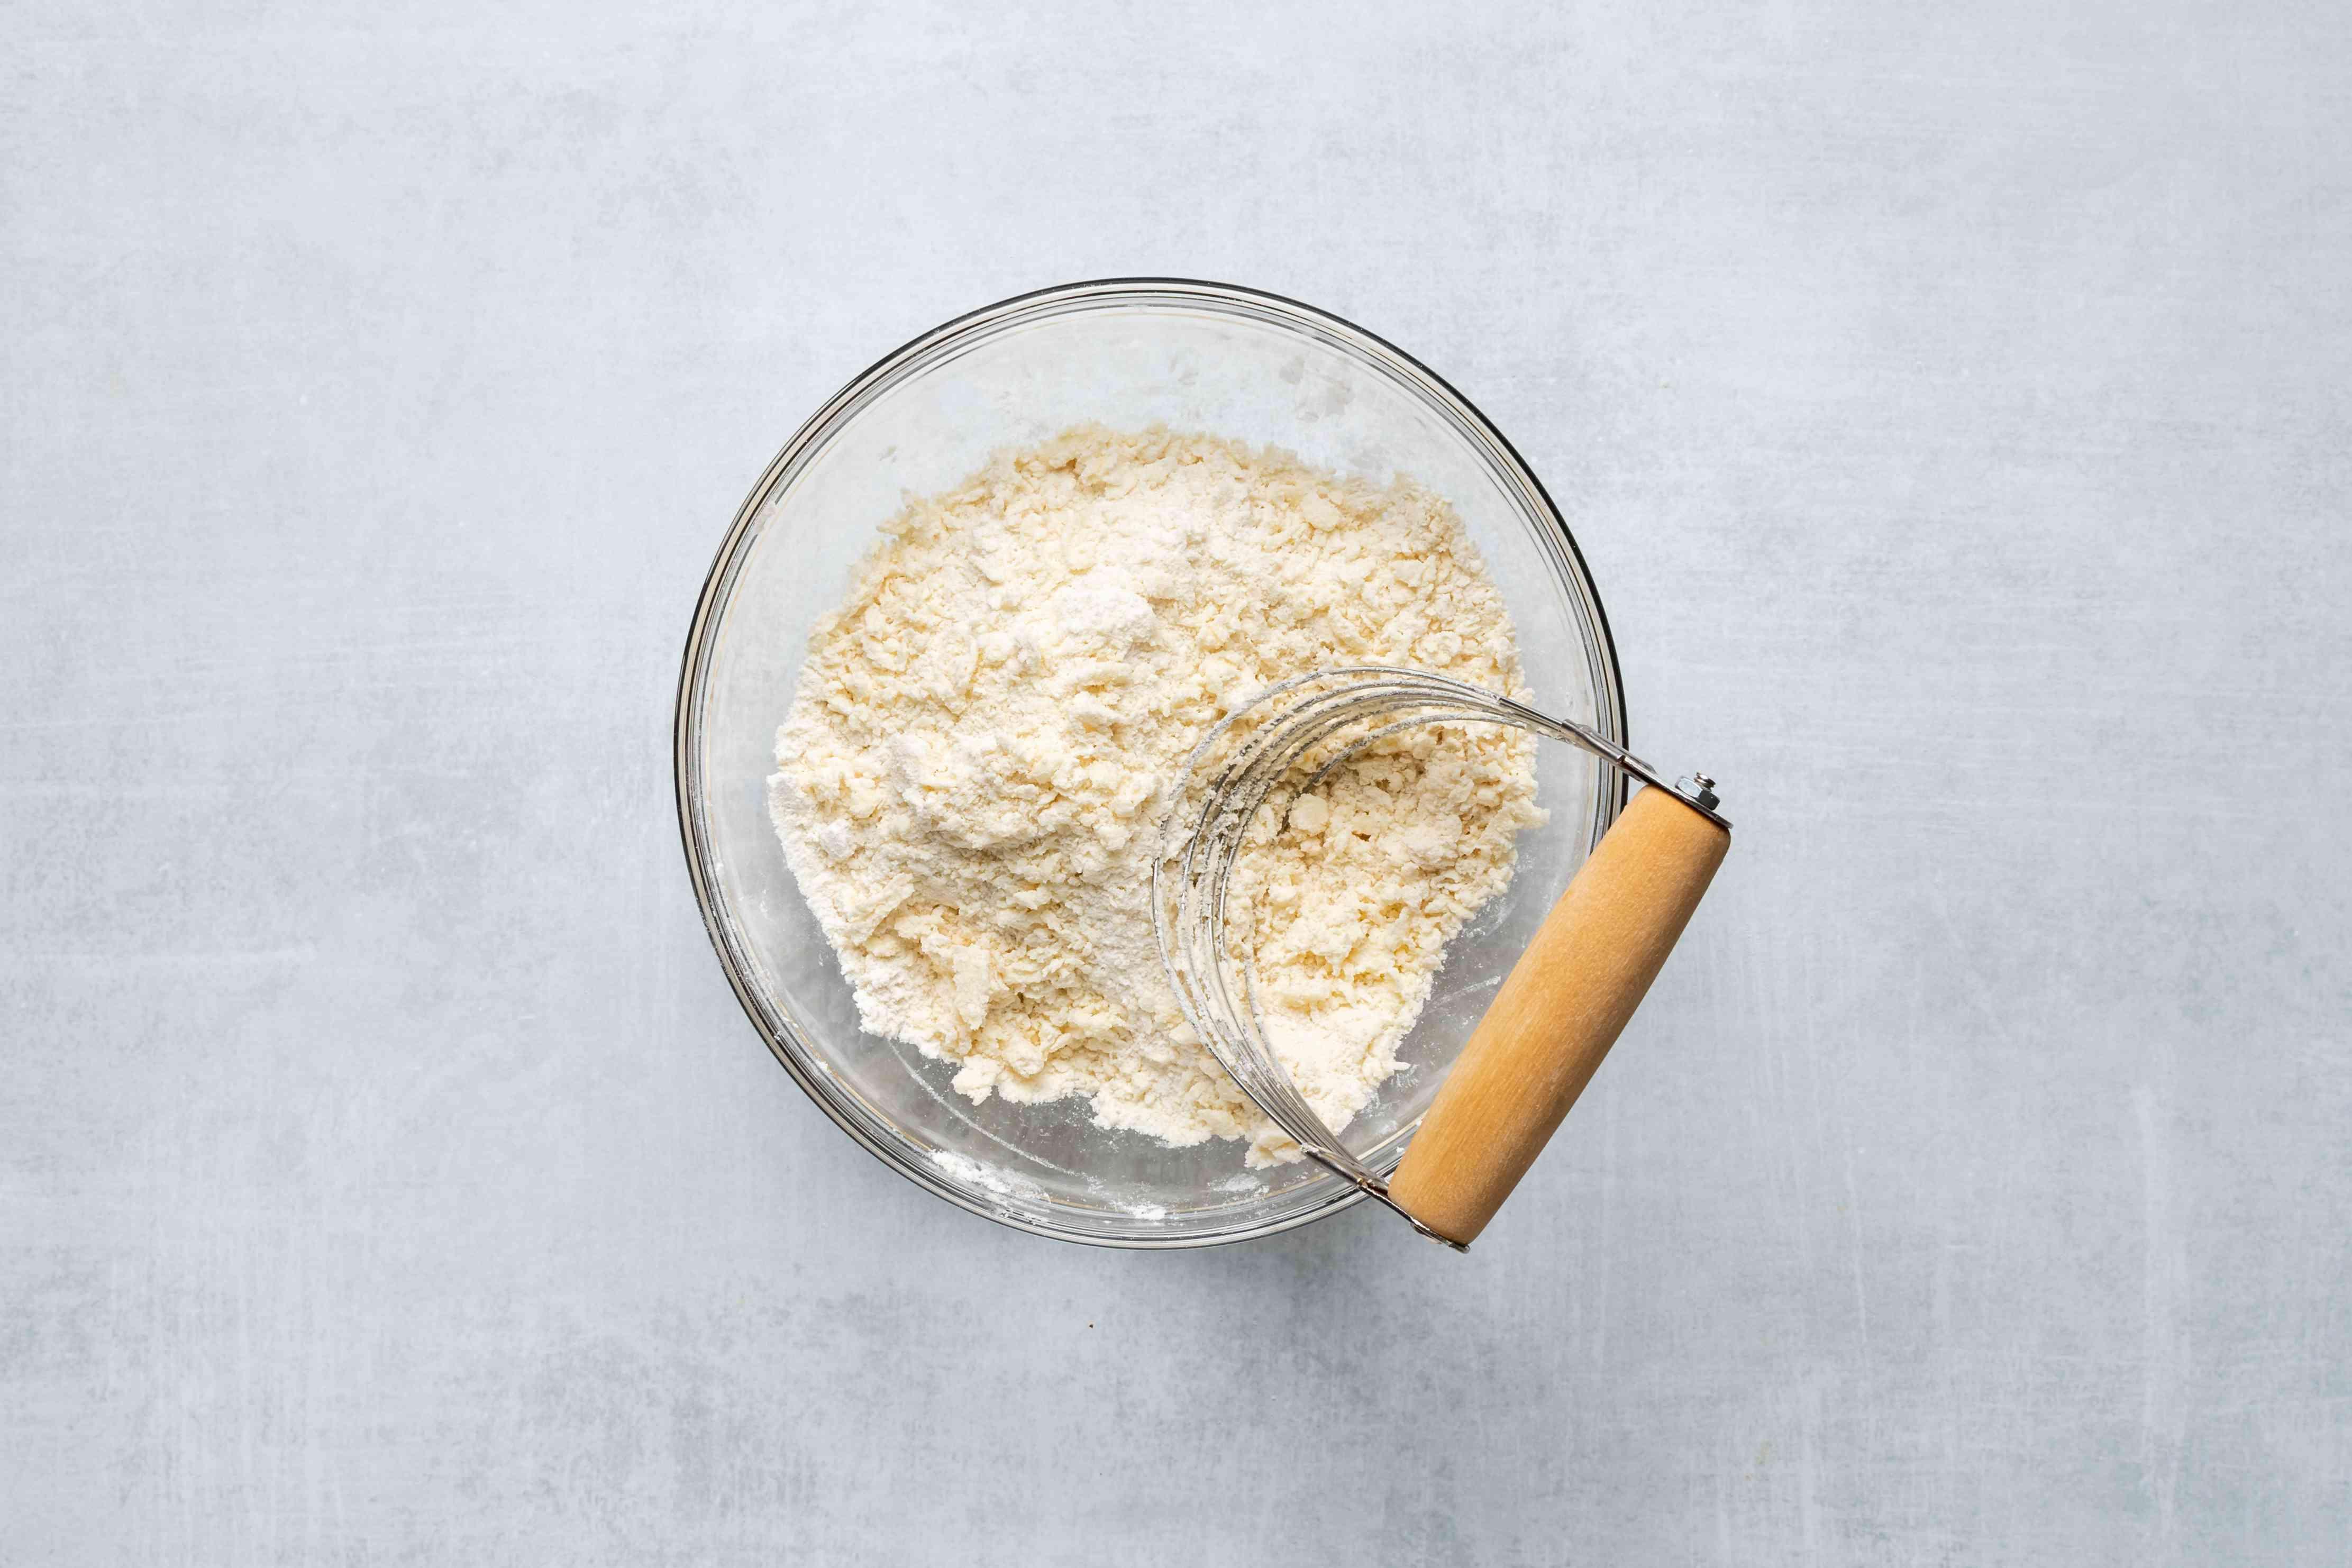 cut butter into the flour mixture